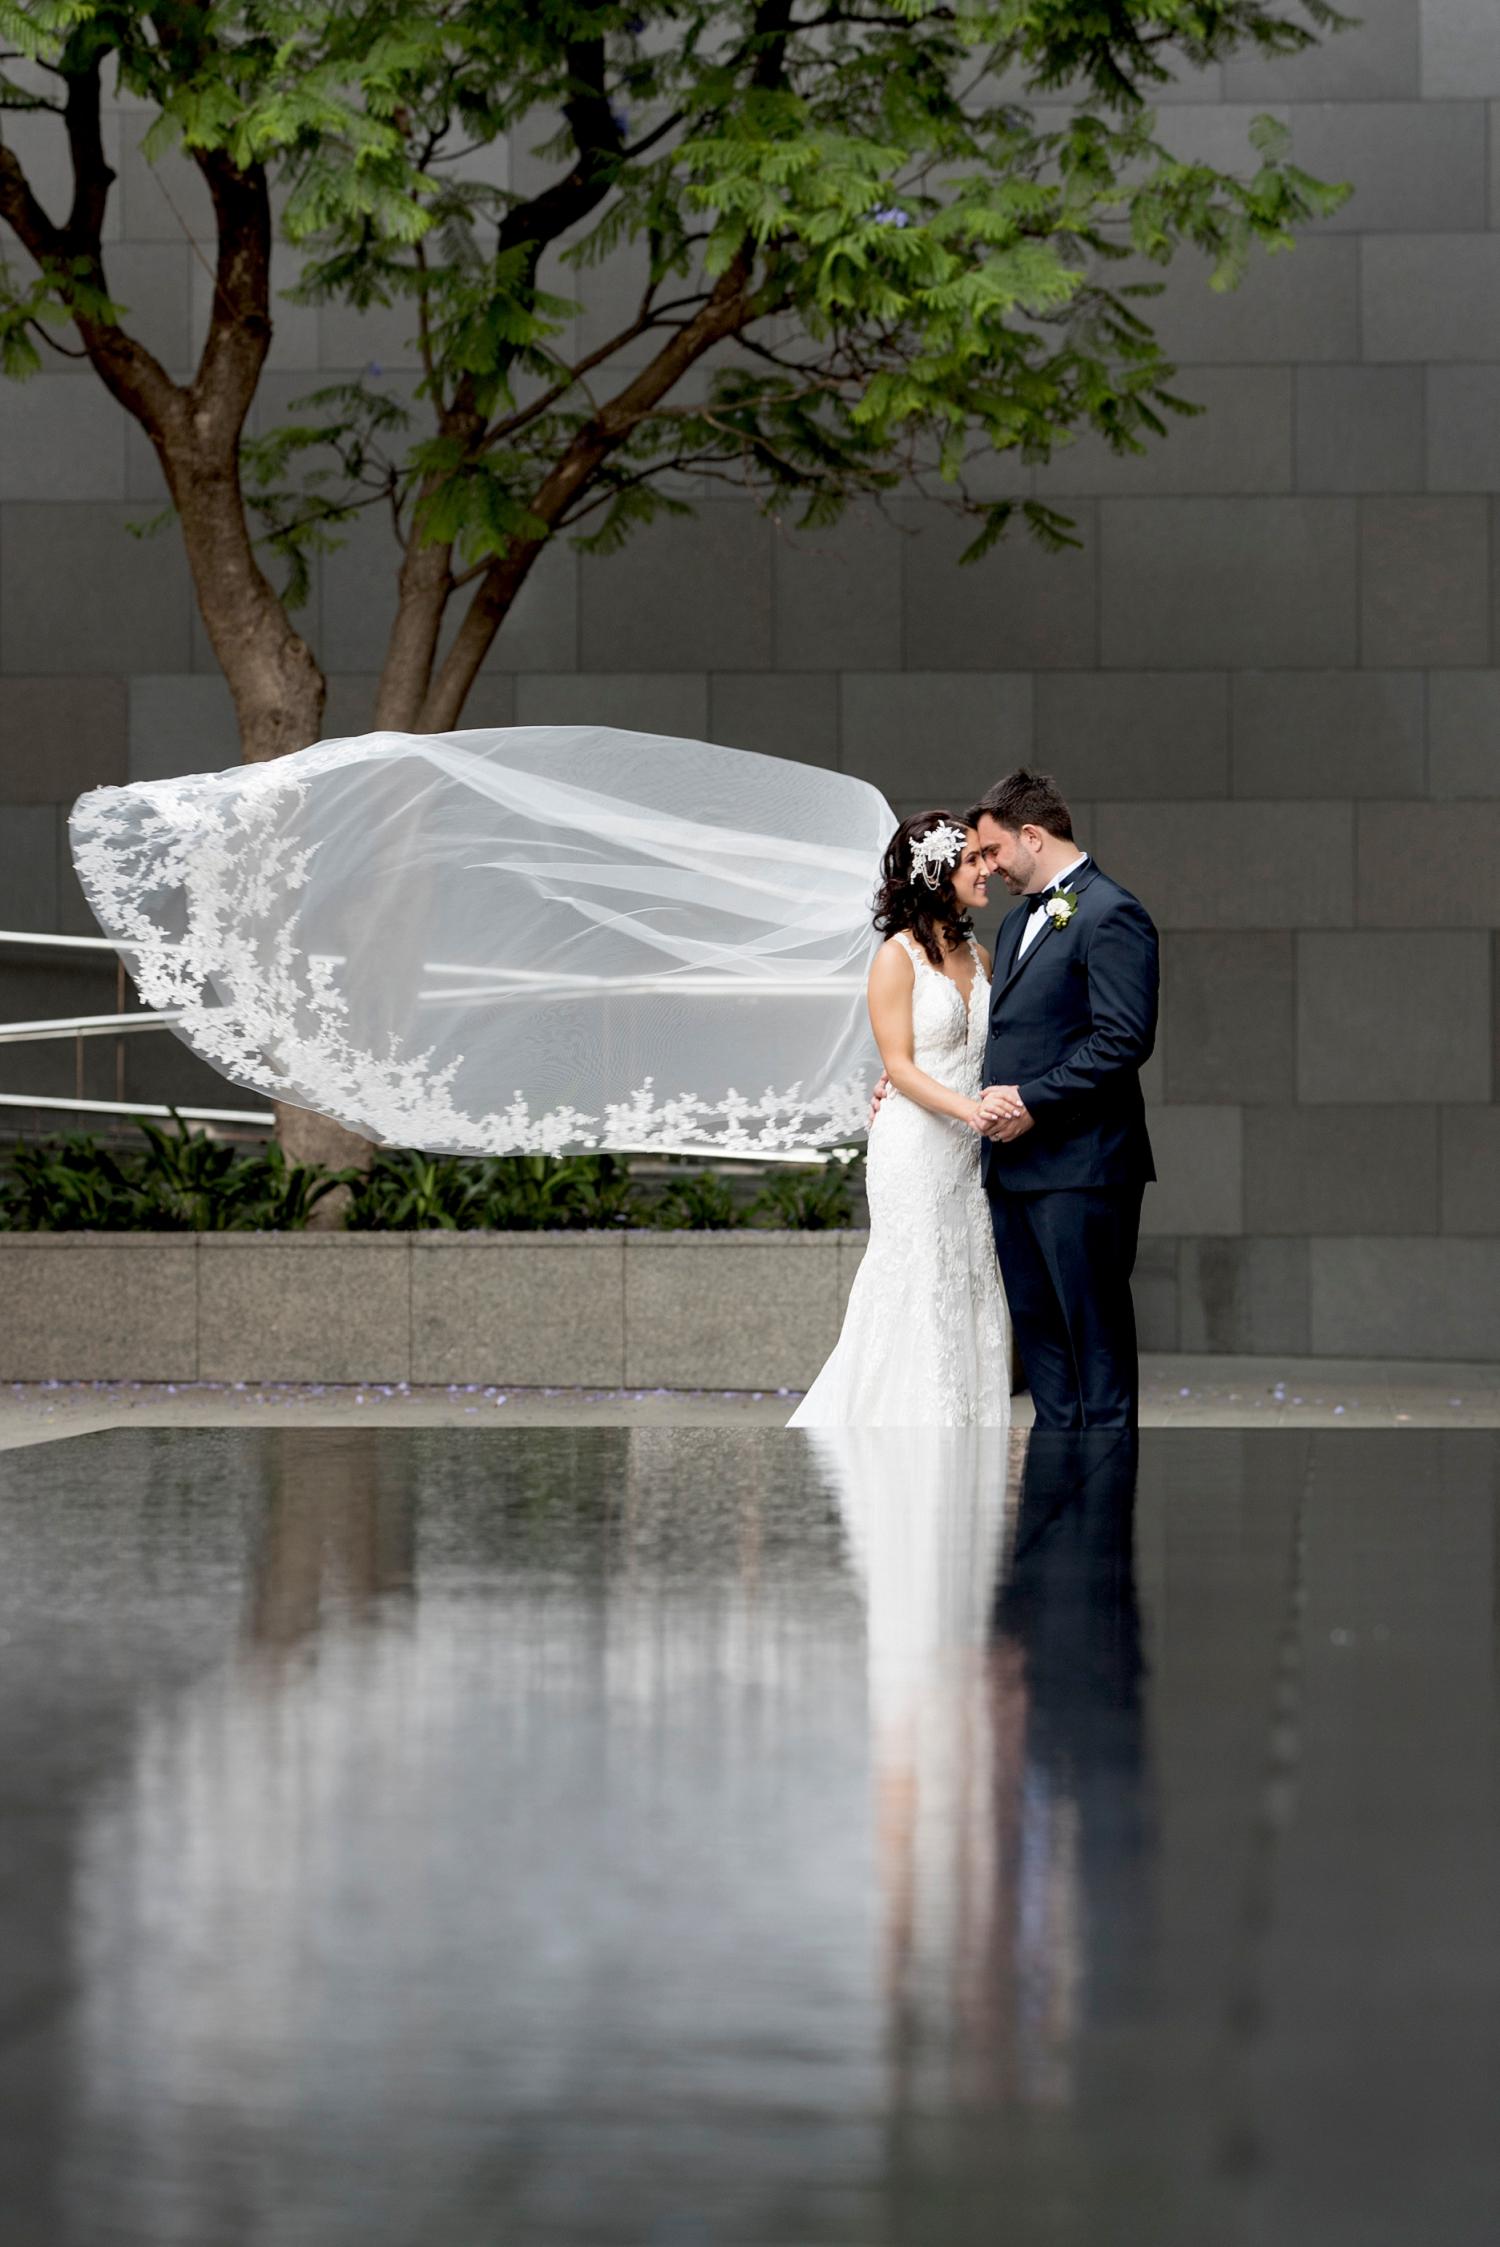 36_treasury buildings wedding photos perth.jpg